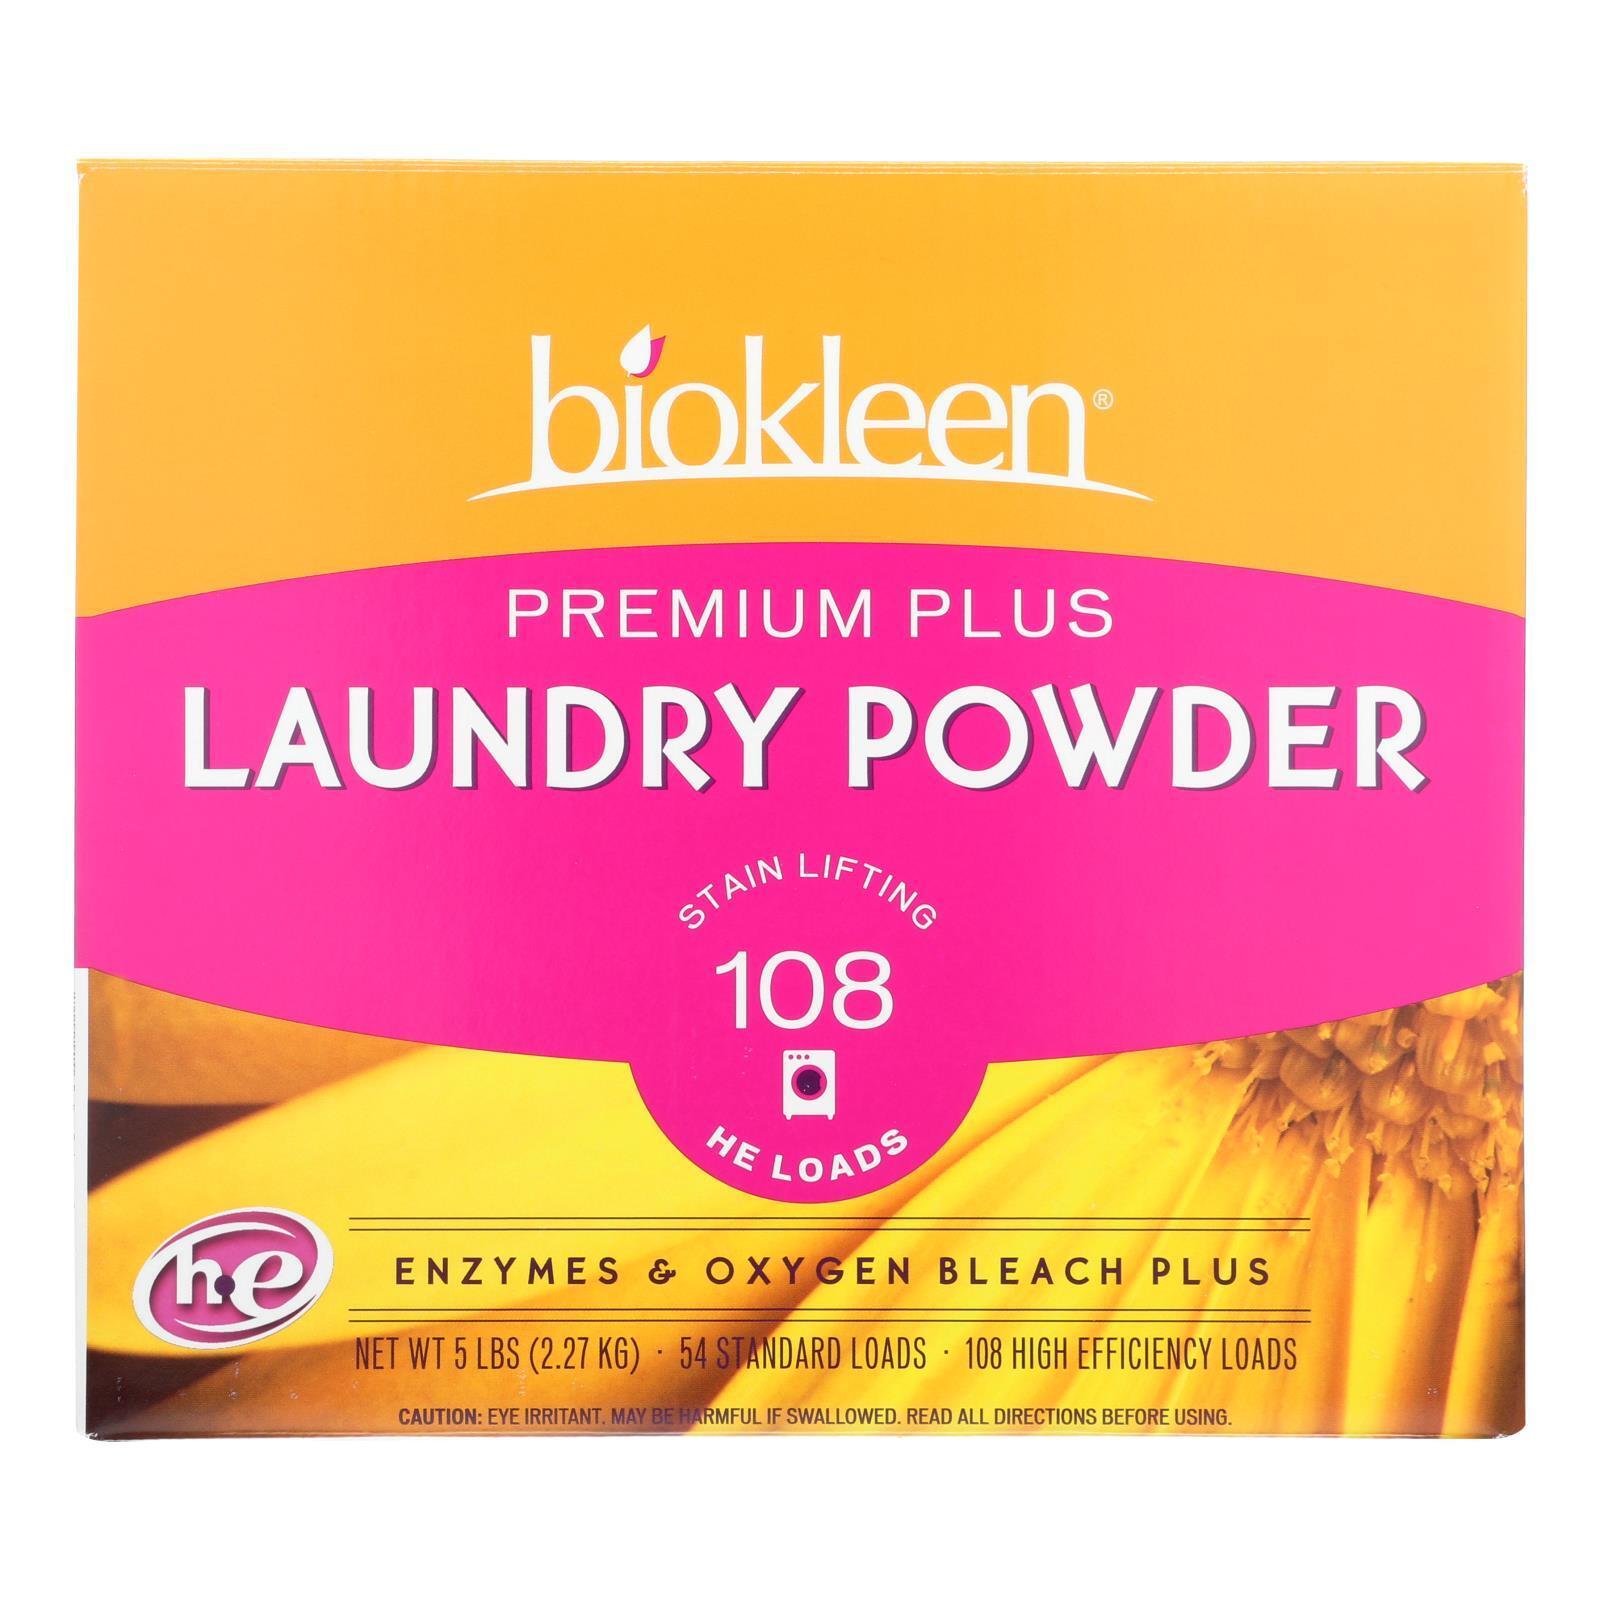 Biokleen Laundry Powder Premium Plus Stain Lifting Enzyme Formula - 5 lbs